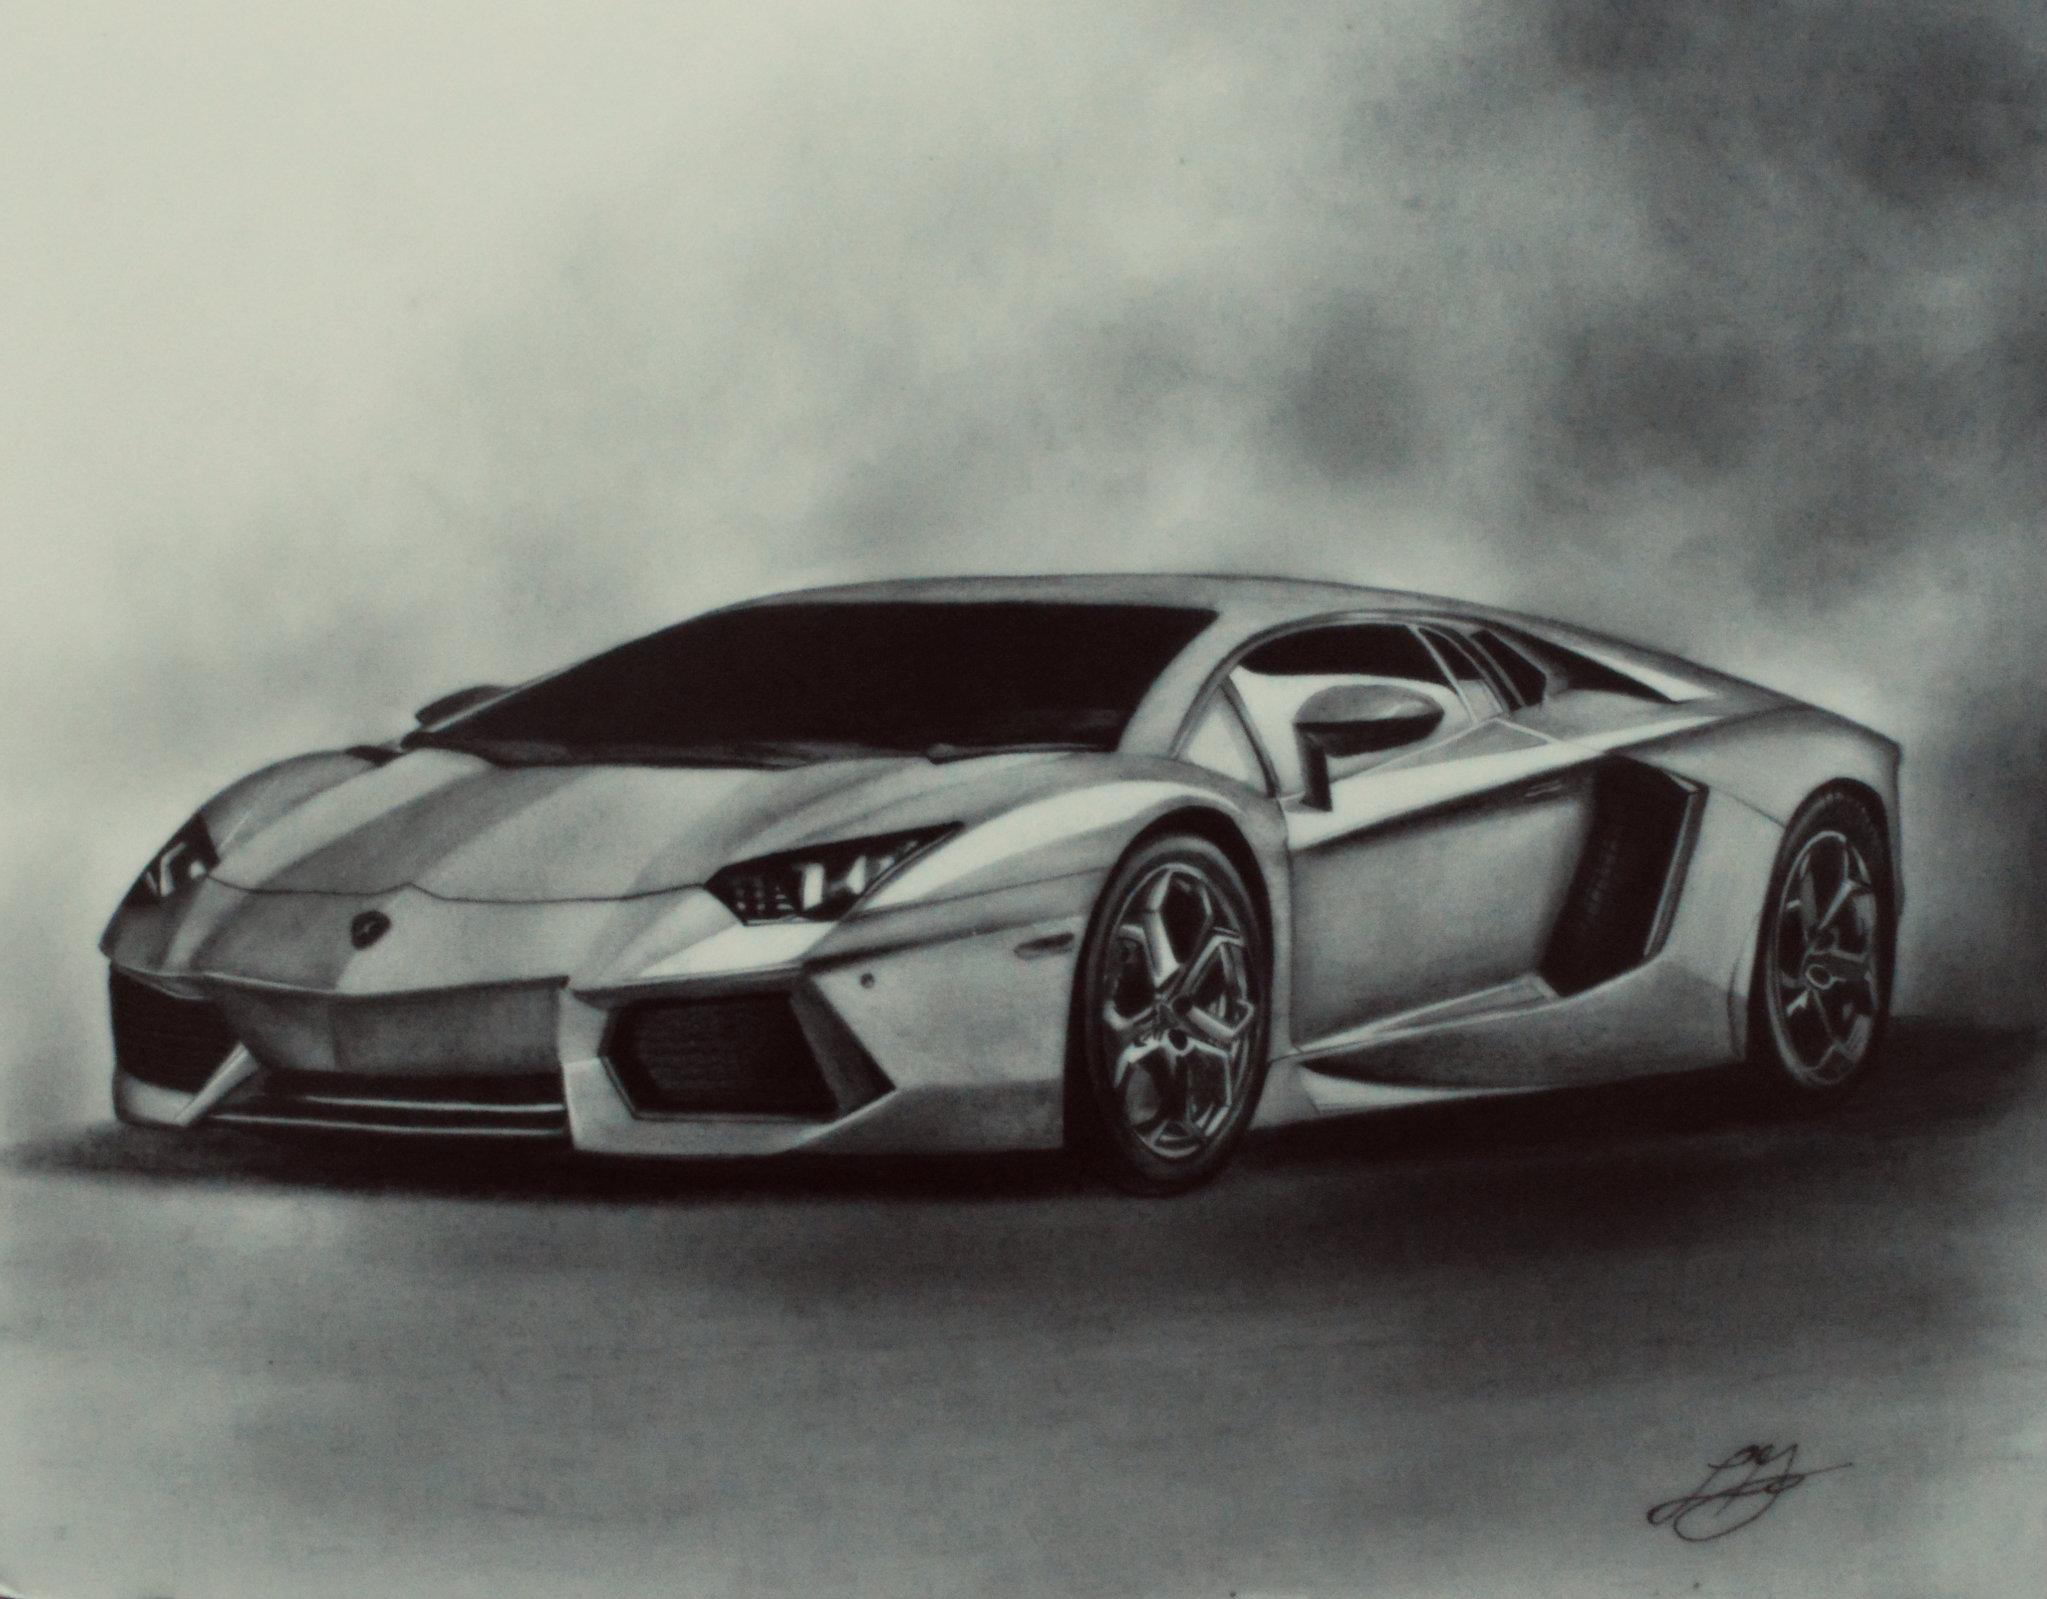 Drawn vehicle pencil shading Drawings Drawings drawing car Car